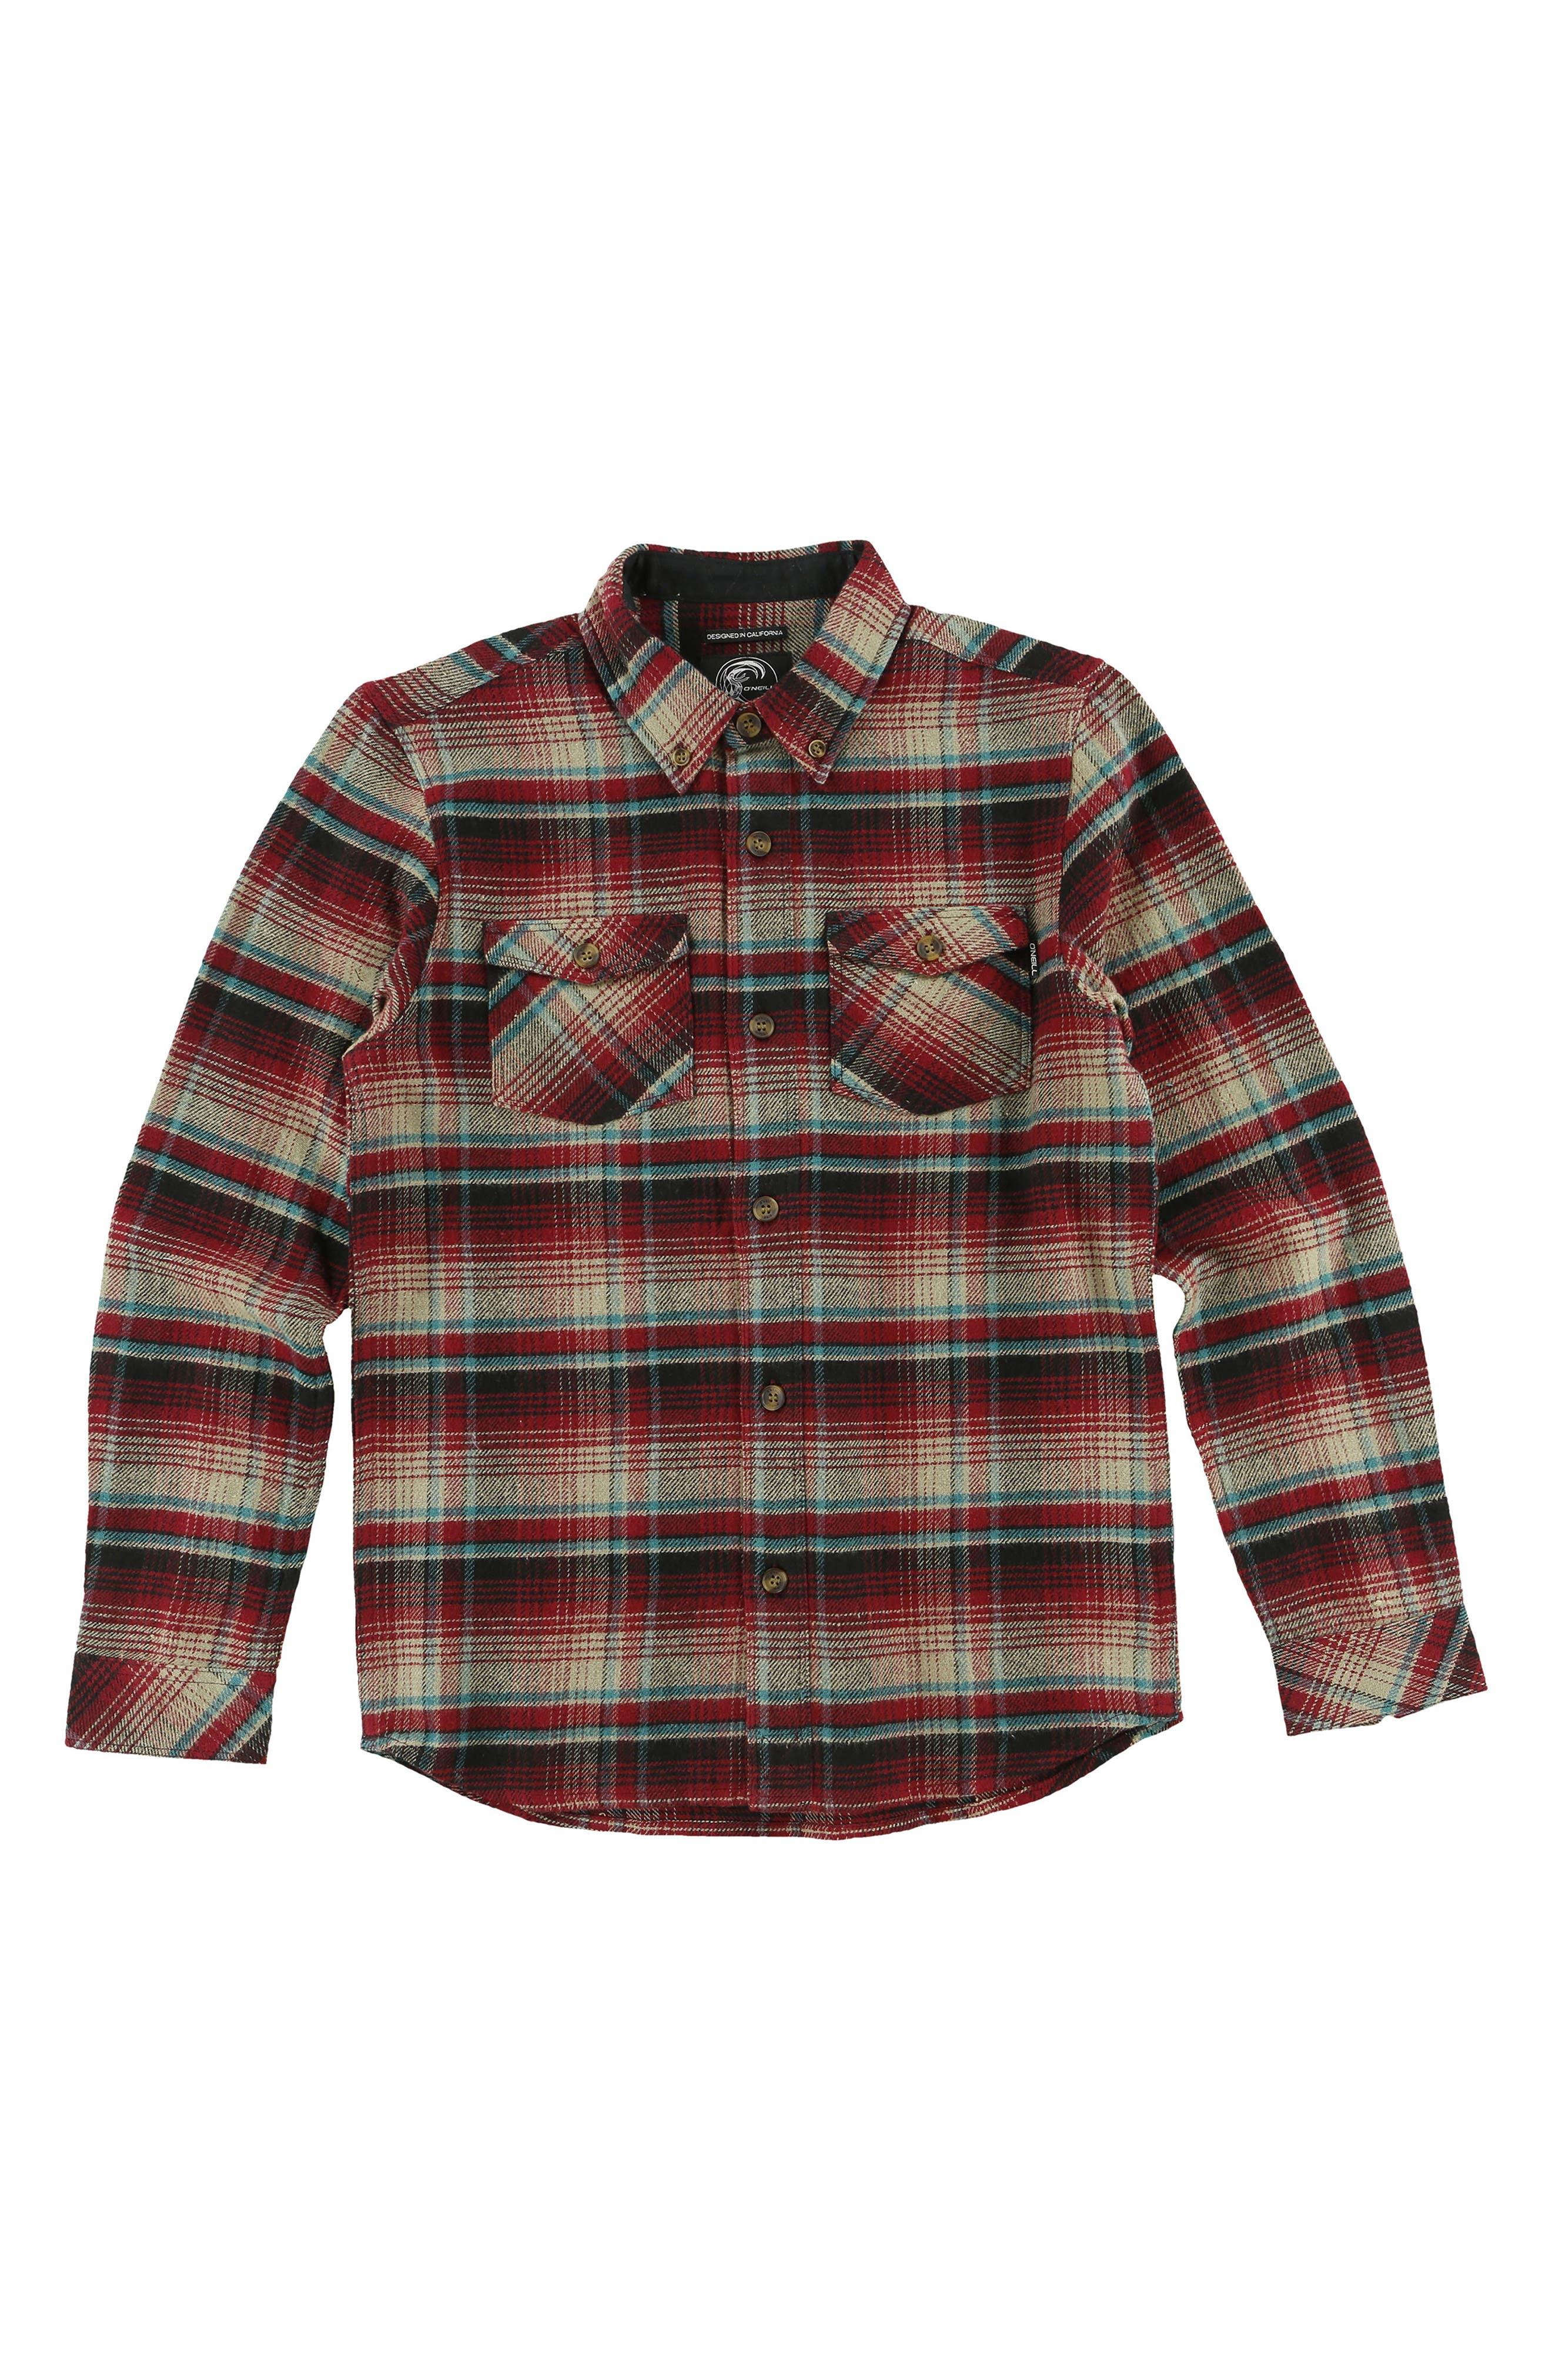 Alternate Image 1 Selected - O'Neill Butler Plaid Flannel Shirt (Big Boys)